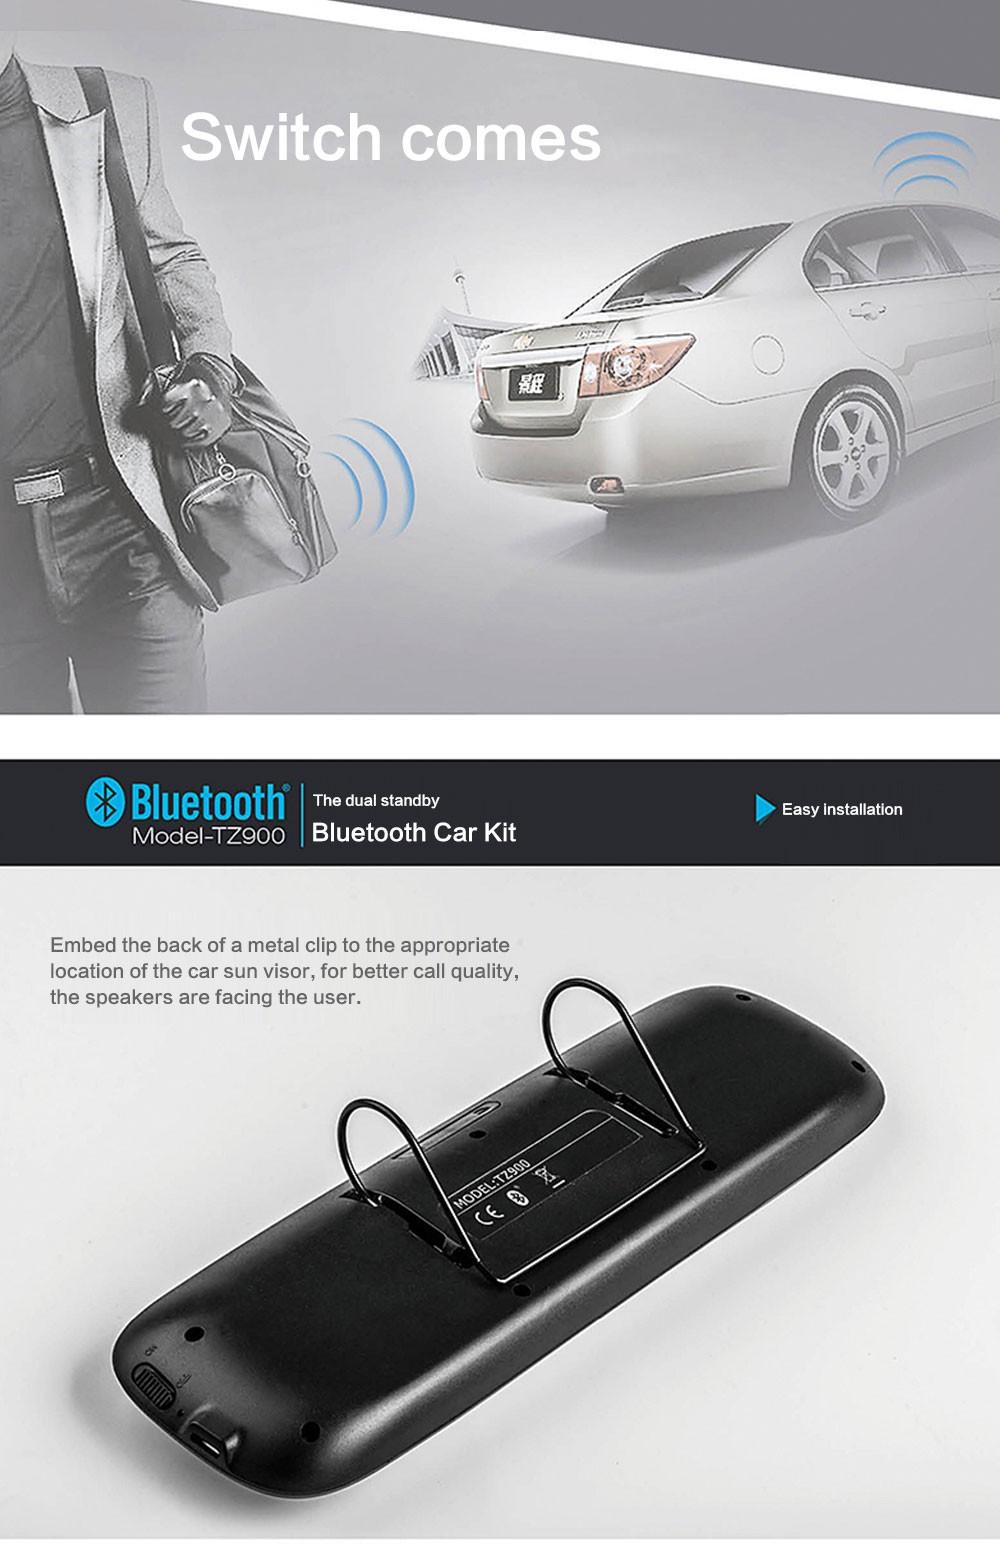 SIYAA TZ900 Bluetooth Car Kit Hands-free Sun Visor Bluetooth Phone Voice Reporting Wireless Navigation MP3 Music Player Speakers